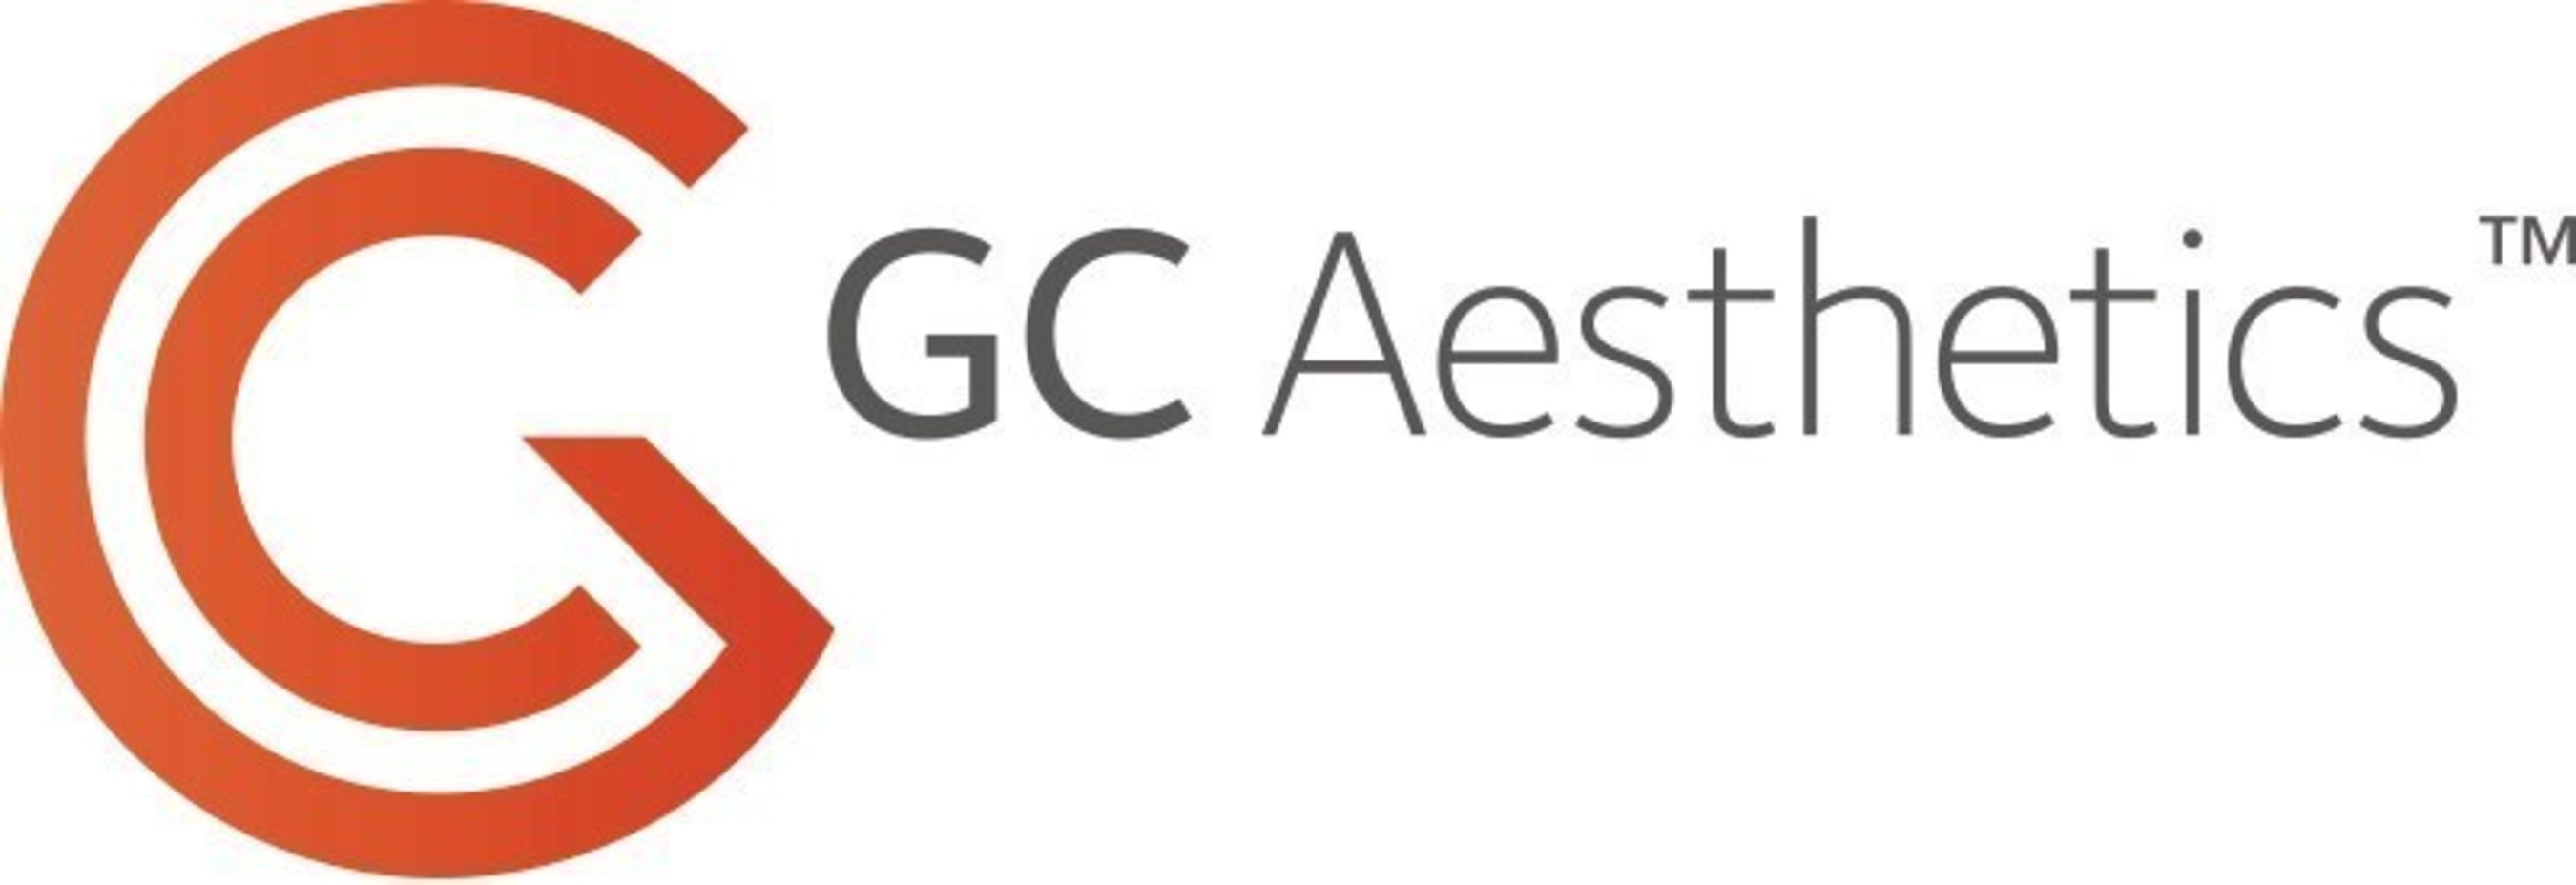 GC Aesthetics Logo (PRNewsFoto/GC Aesthetics)